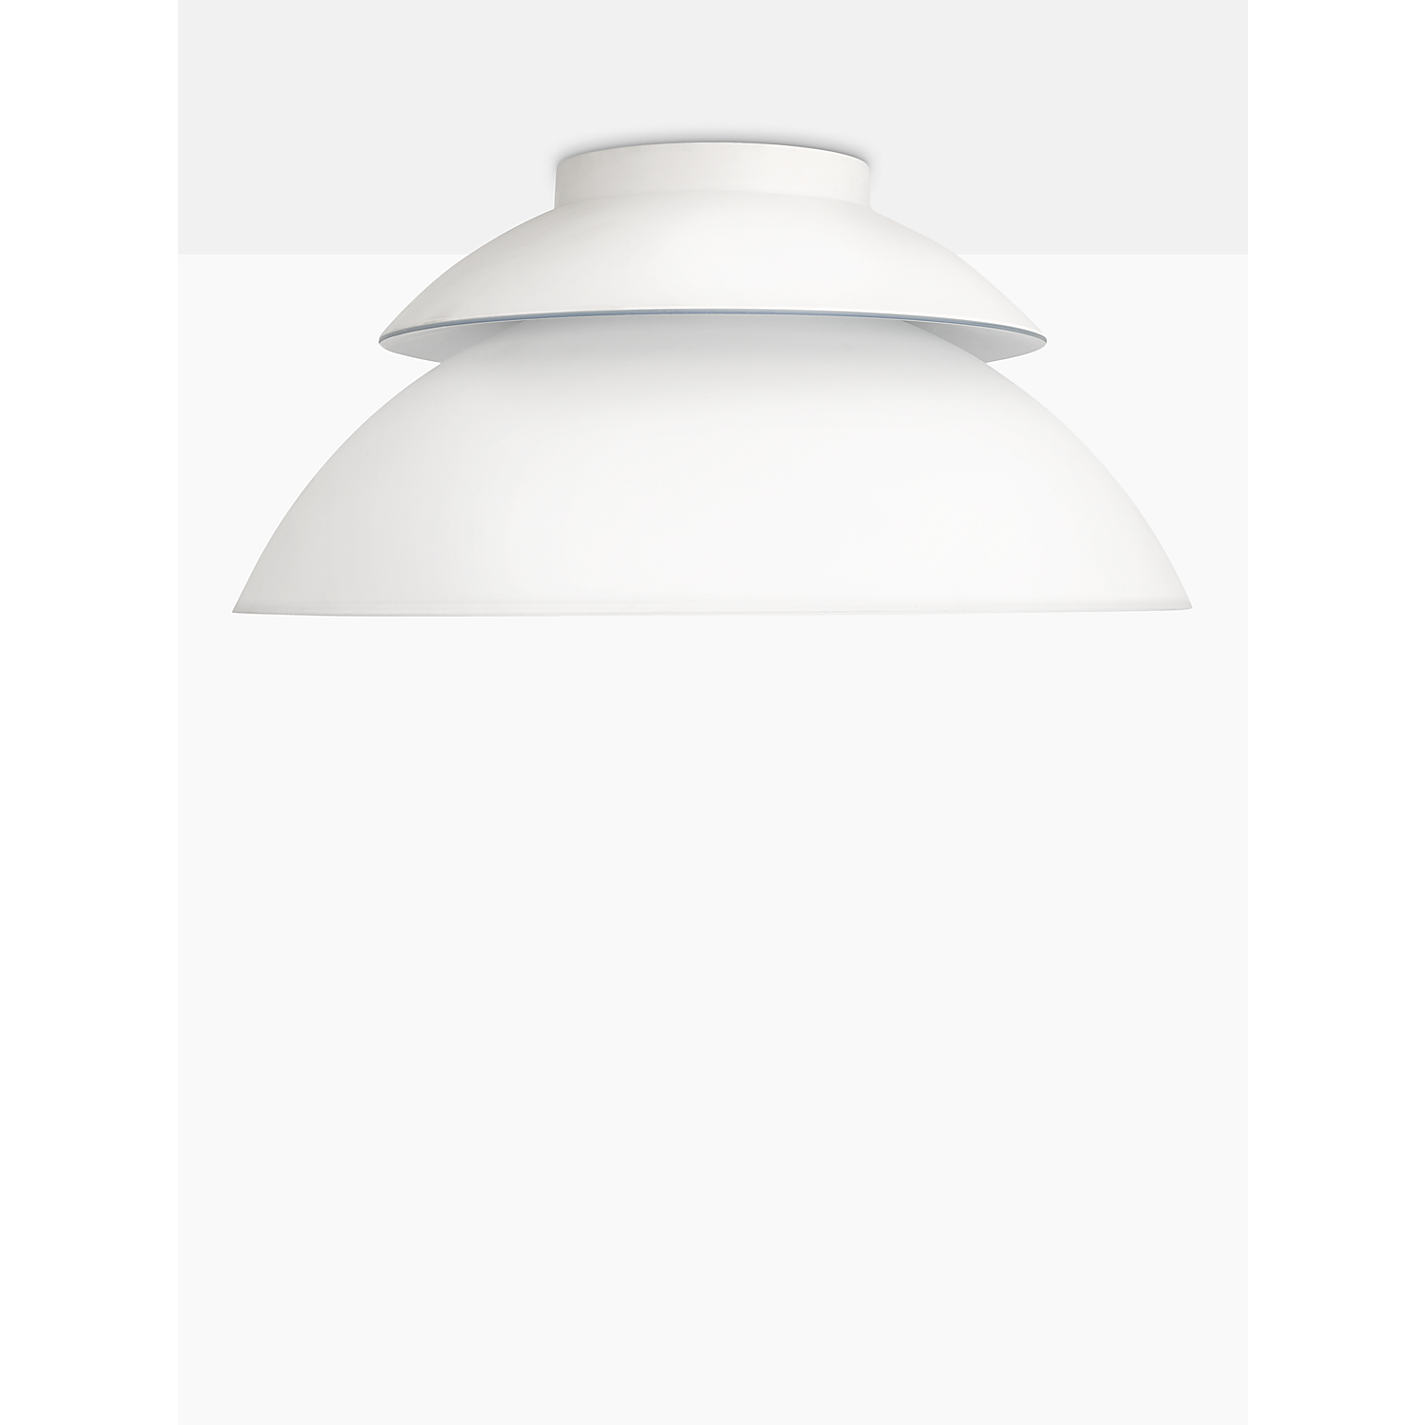 Buy philips hue beyond semi flush led ceiling light john lewis buy philips hue beyond semi flush led ceiling light online at johnlewis aloadofball Images